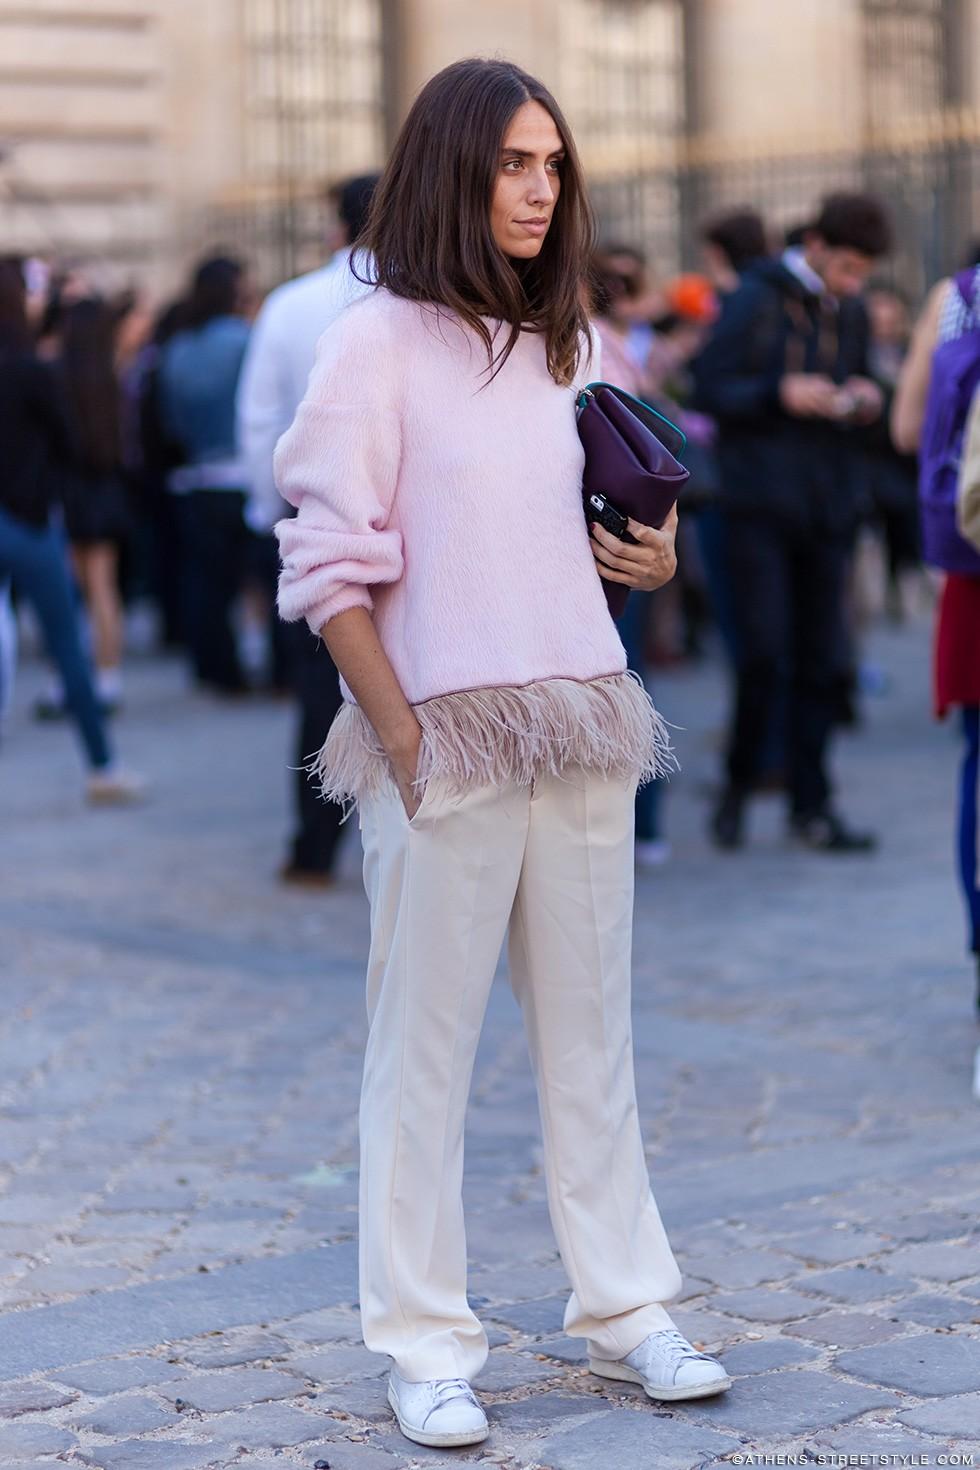 Athens-Streetstyle-Erika-Boldrin-Paris-Fashion-Week-Spring-Summer-2015-Street-Style-4050-980x1470